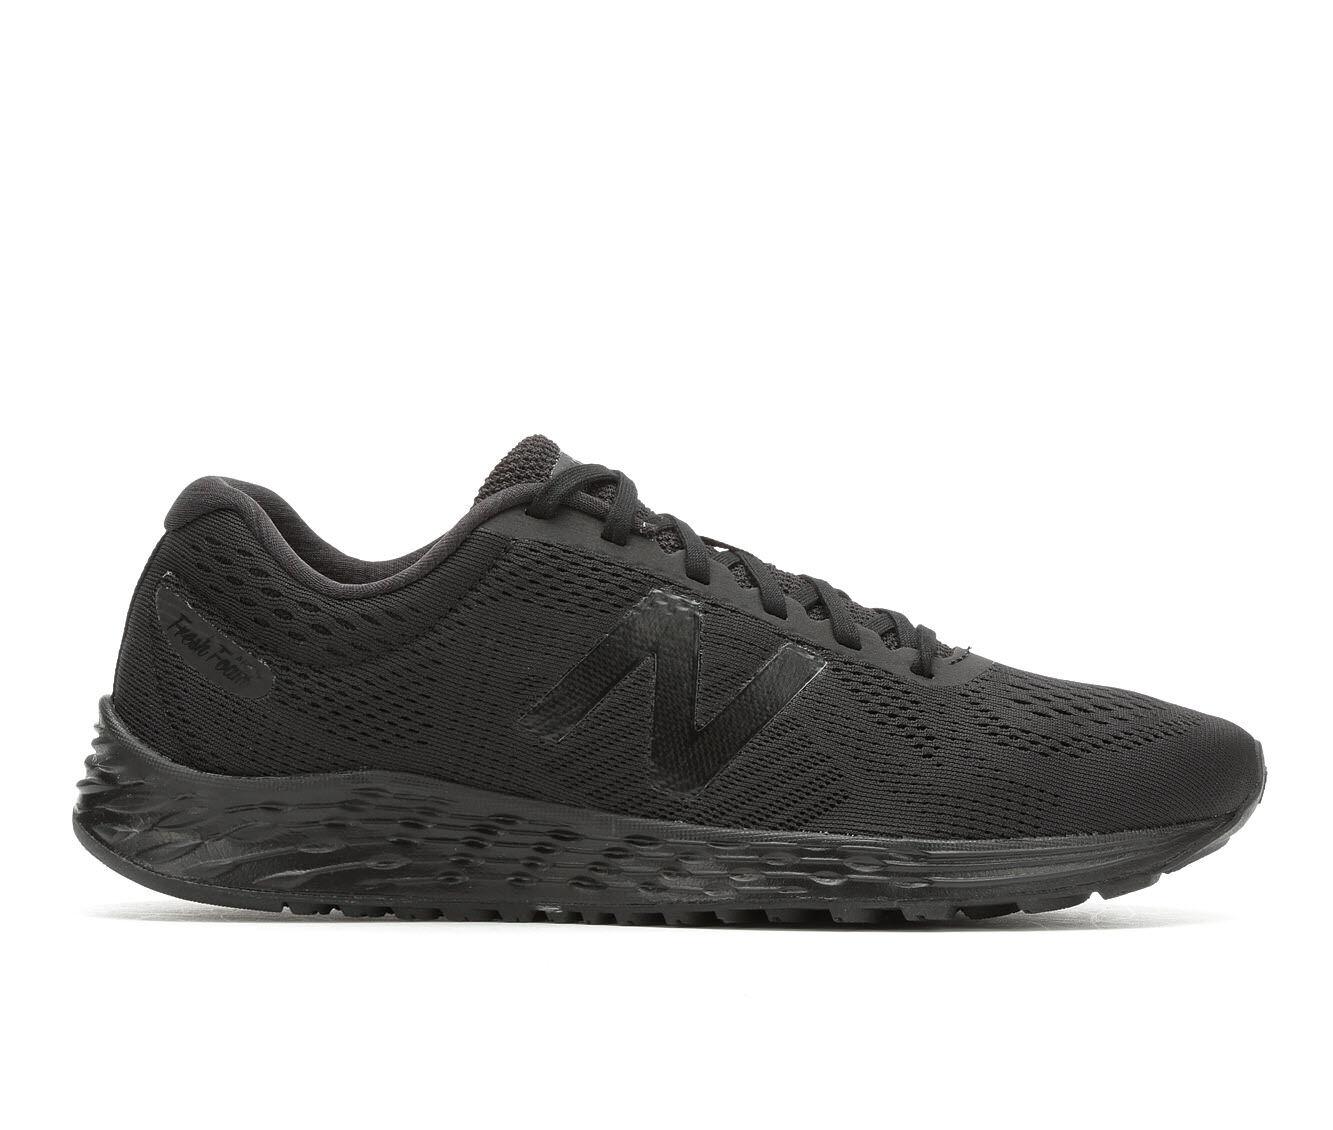 Men's New Balance Arishi Running Shoes Blk/Blk